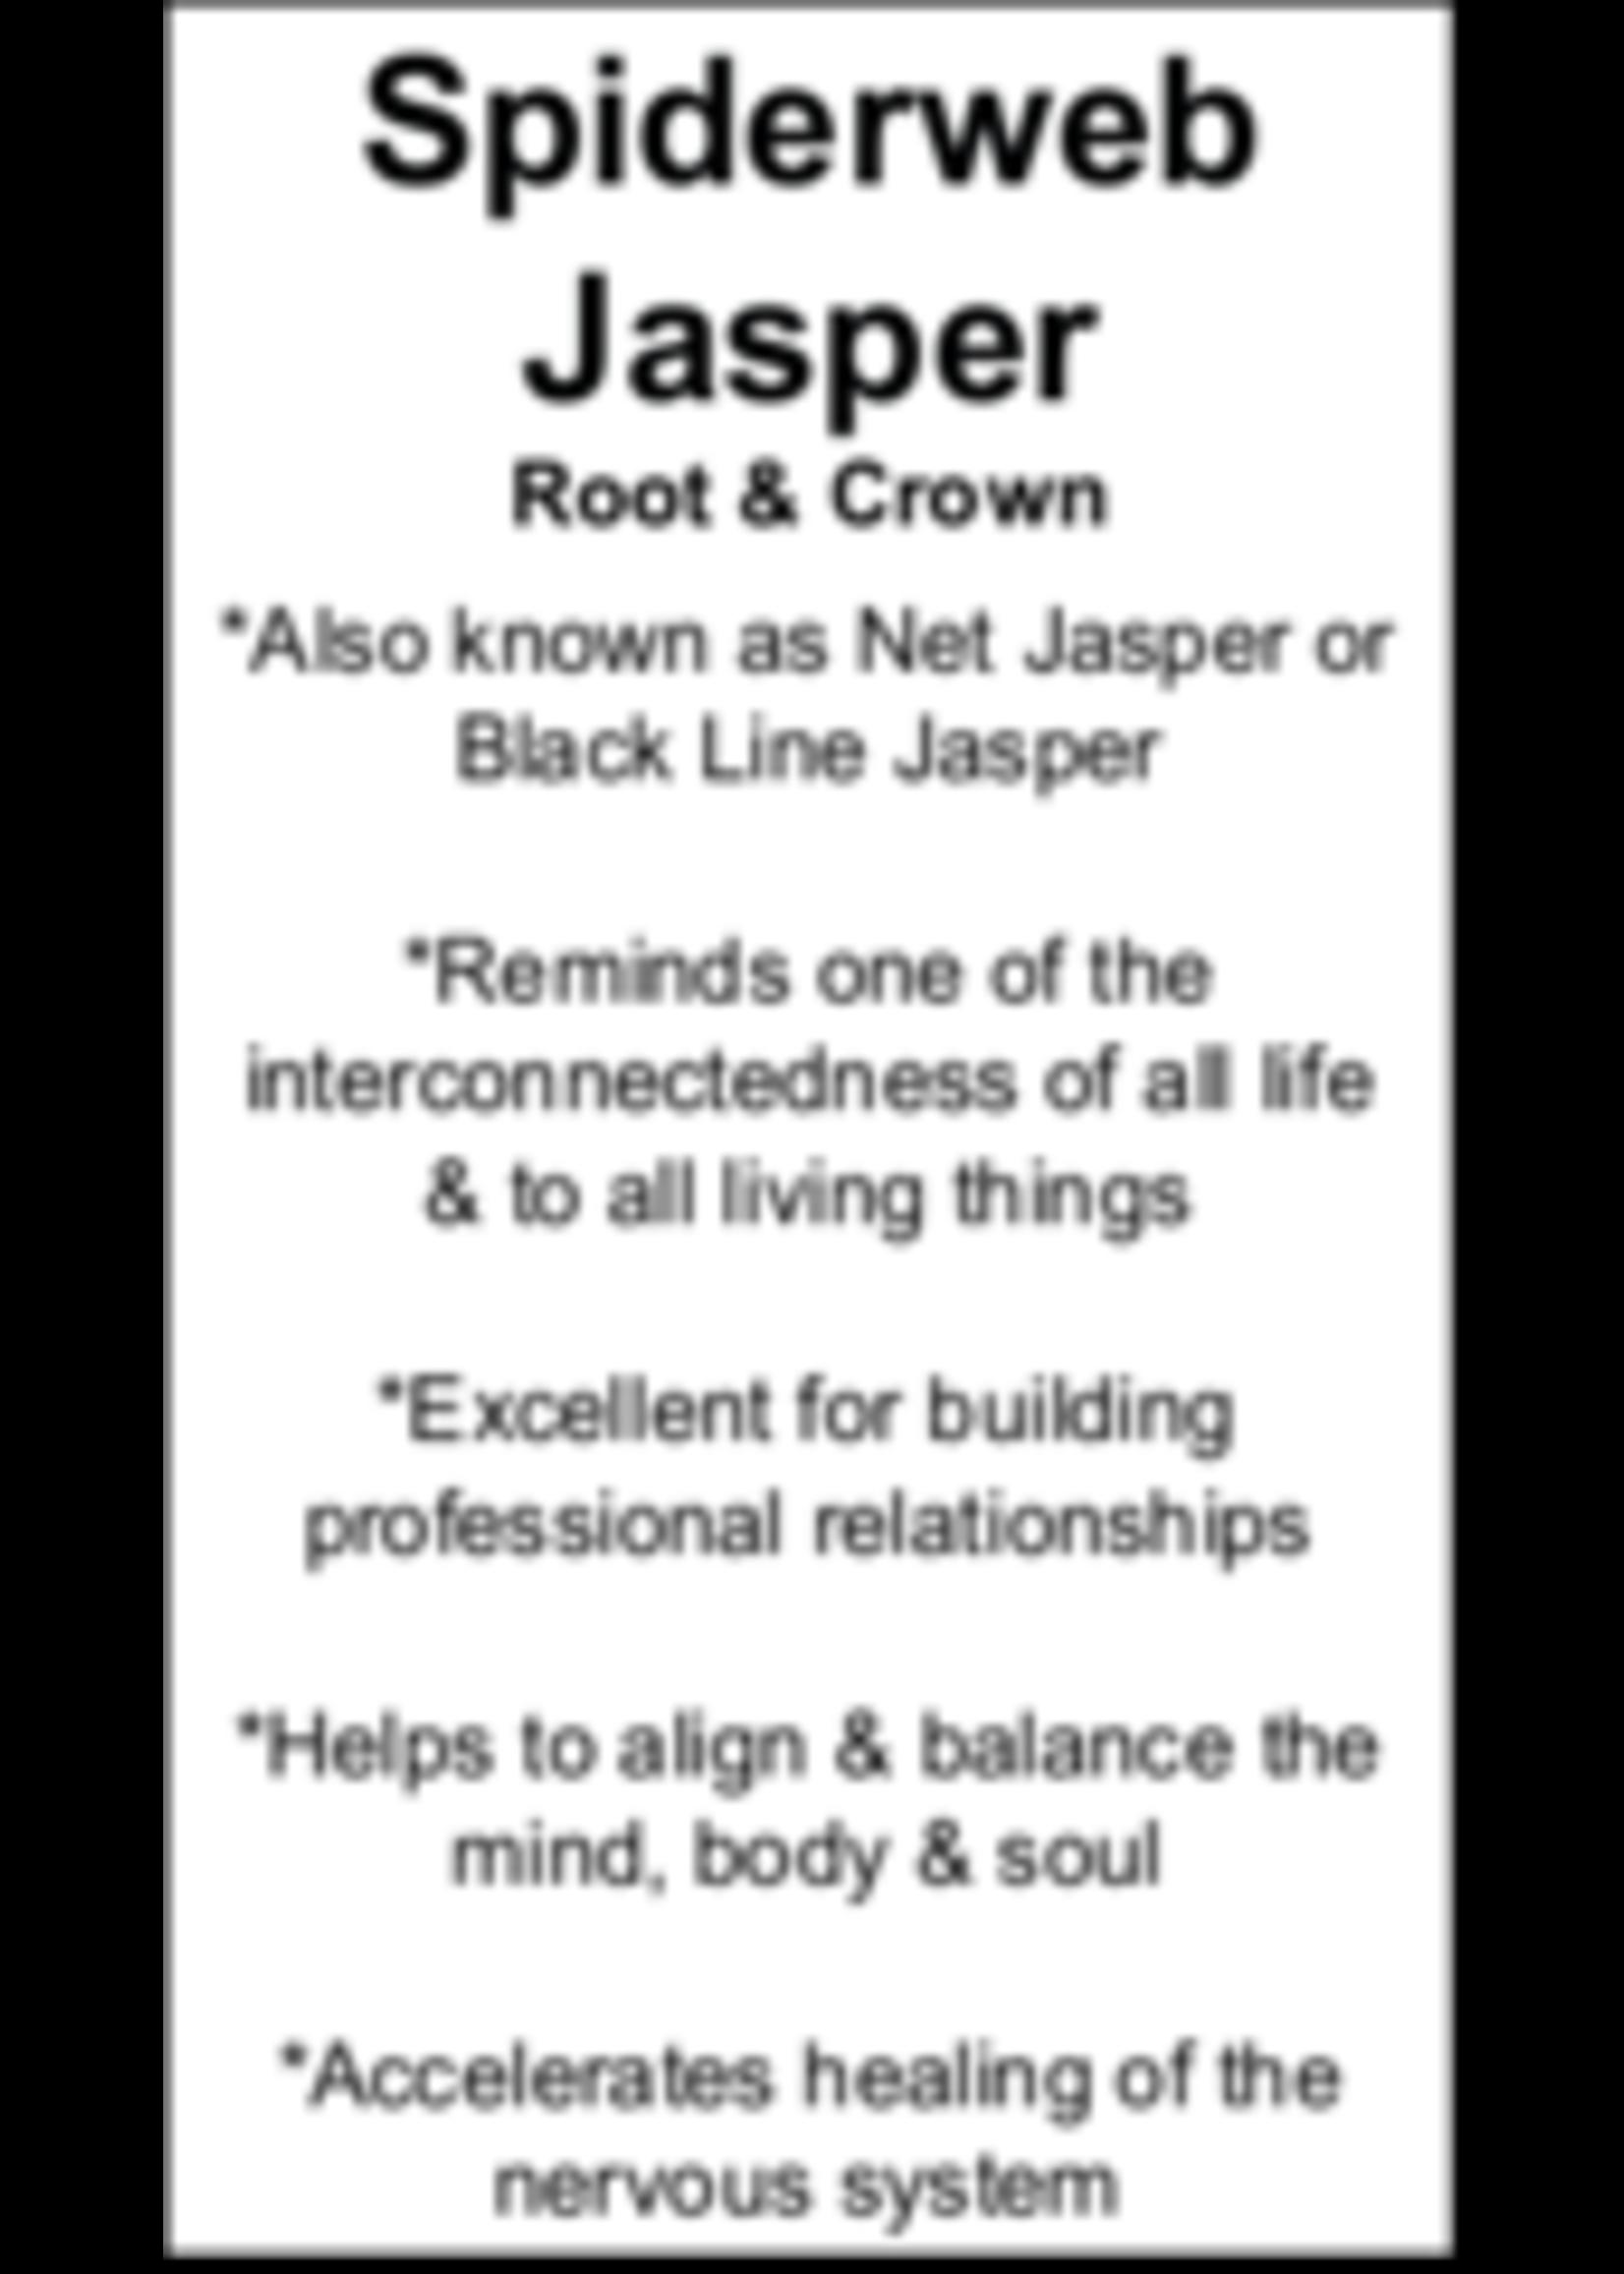 Spiderweb Jasper Cards - Box of 250